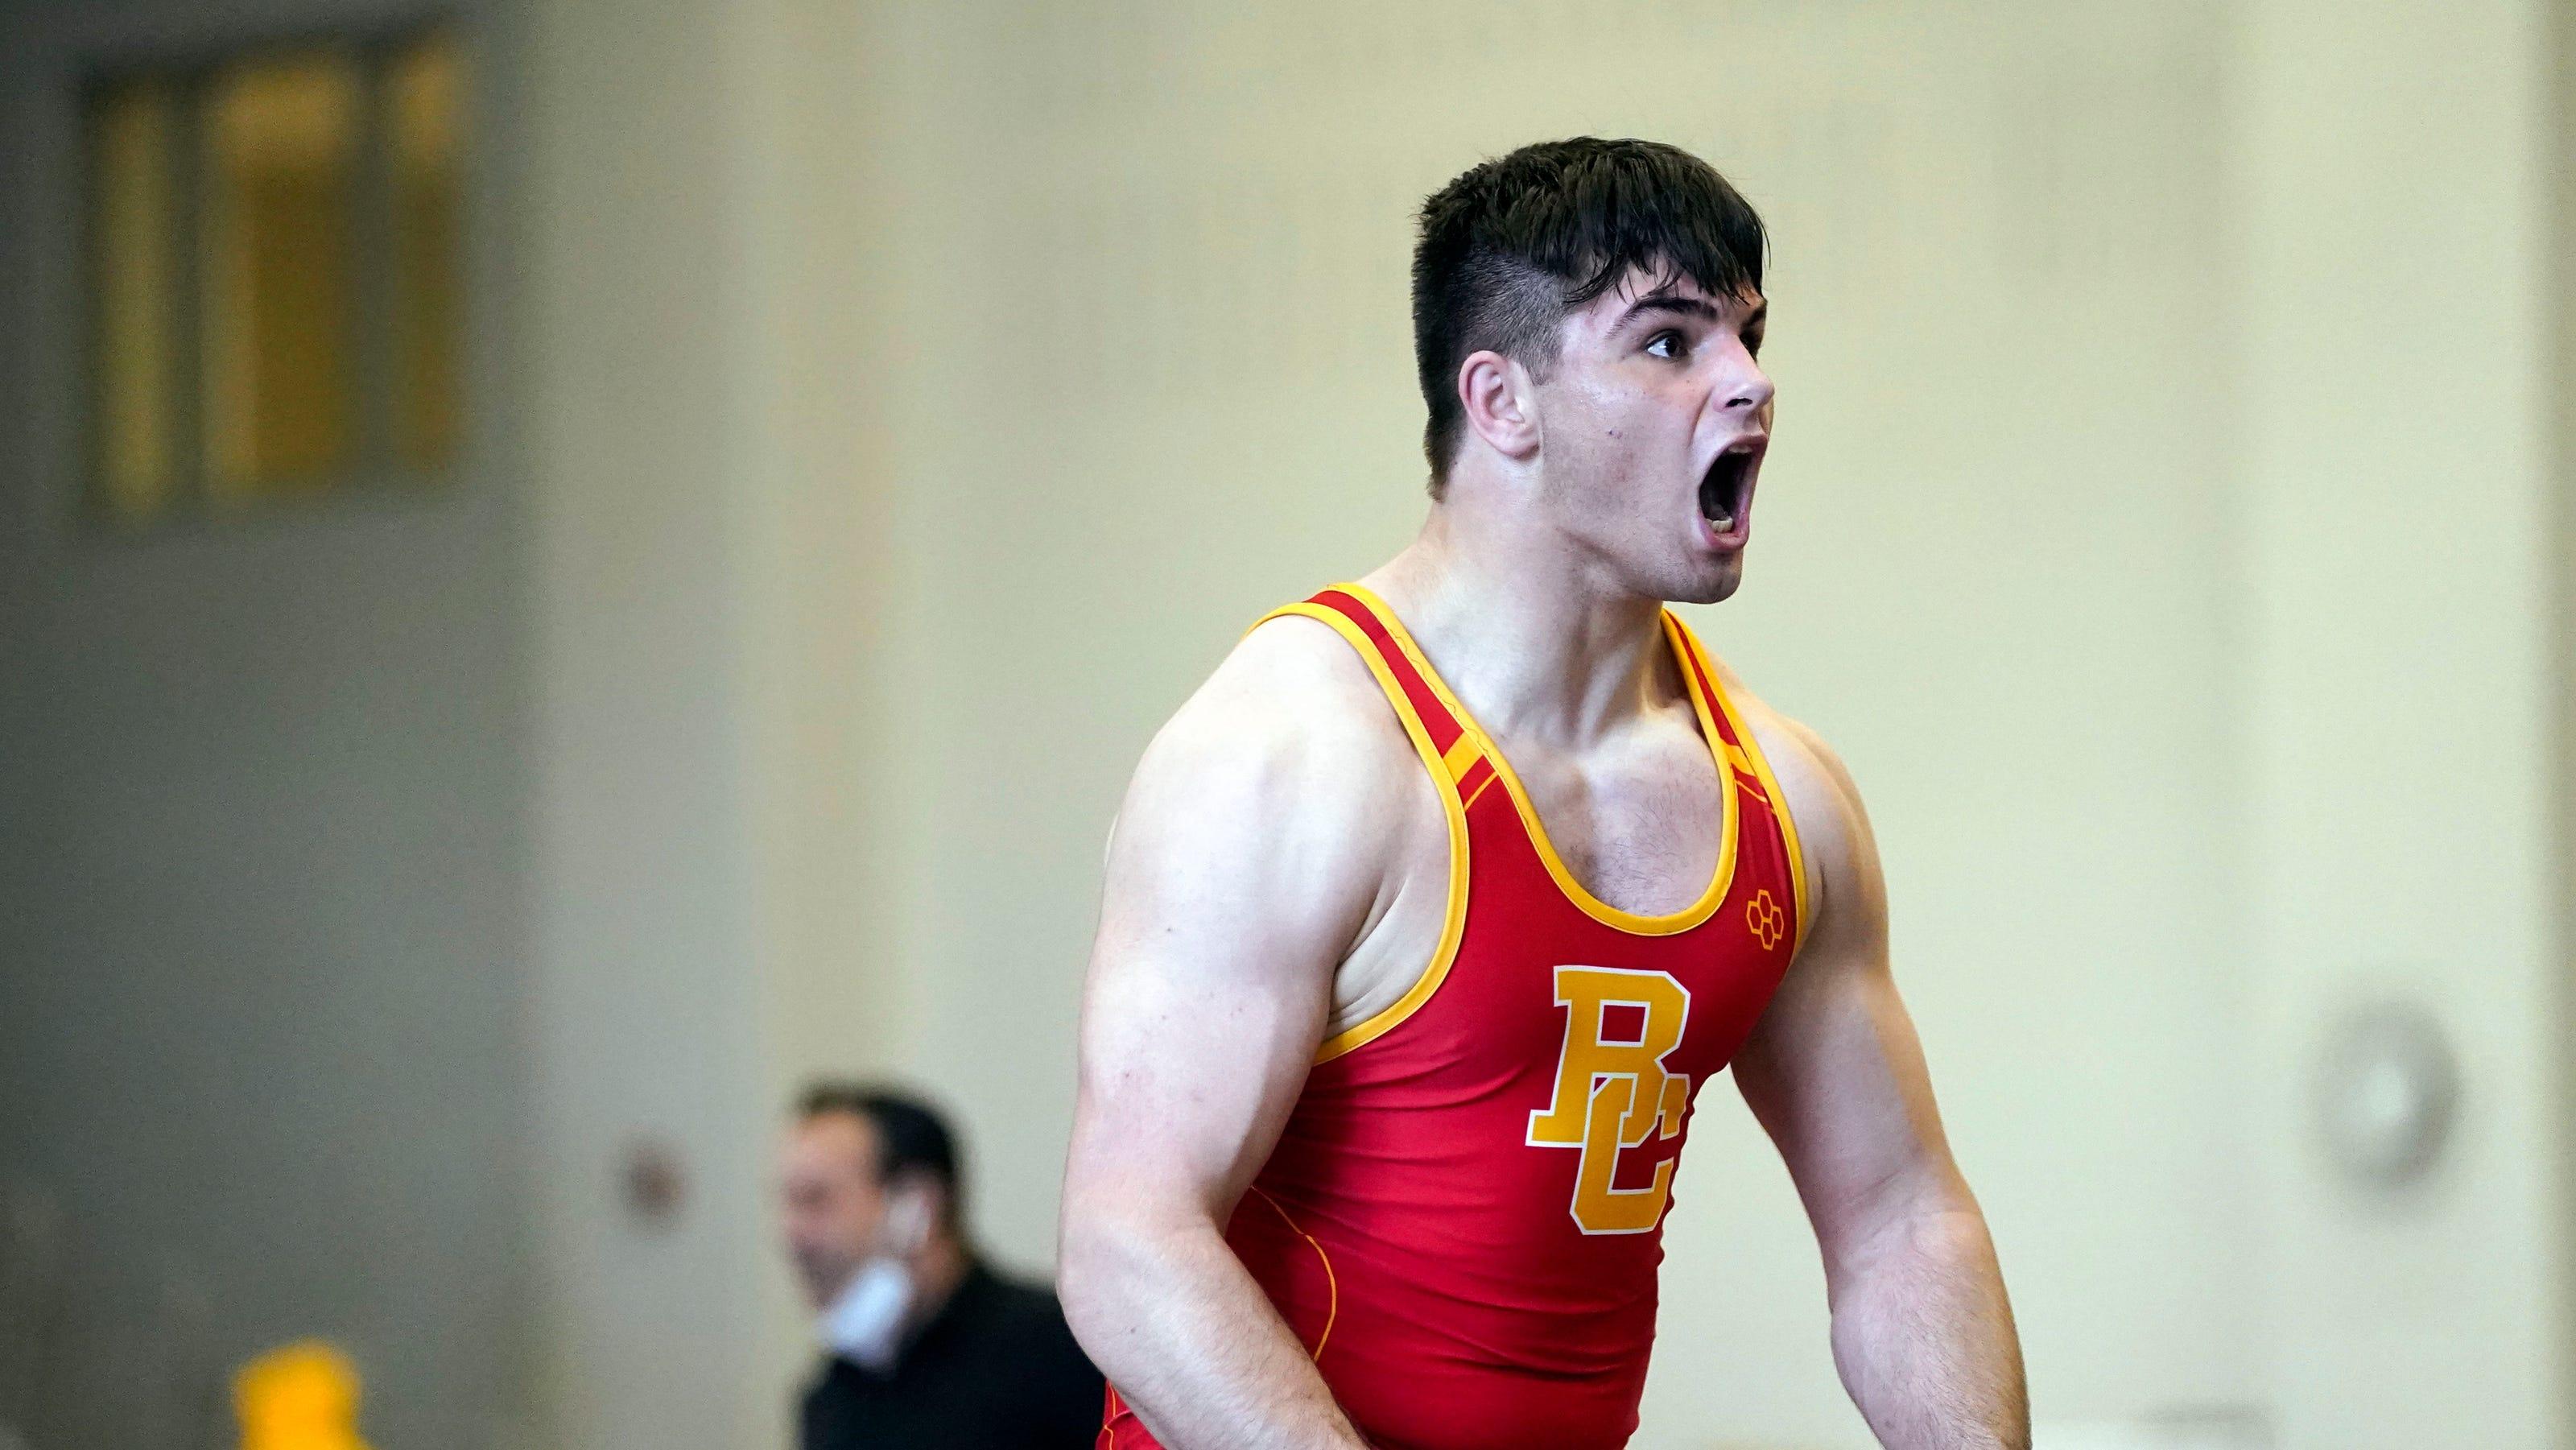 NJ wrestling: 2021 All-North Jersey teams